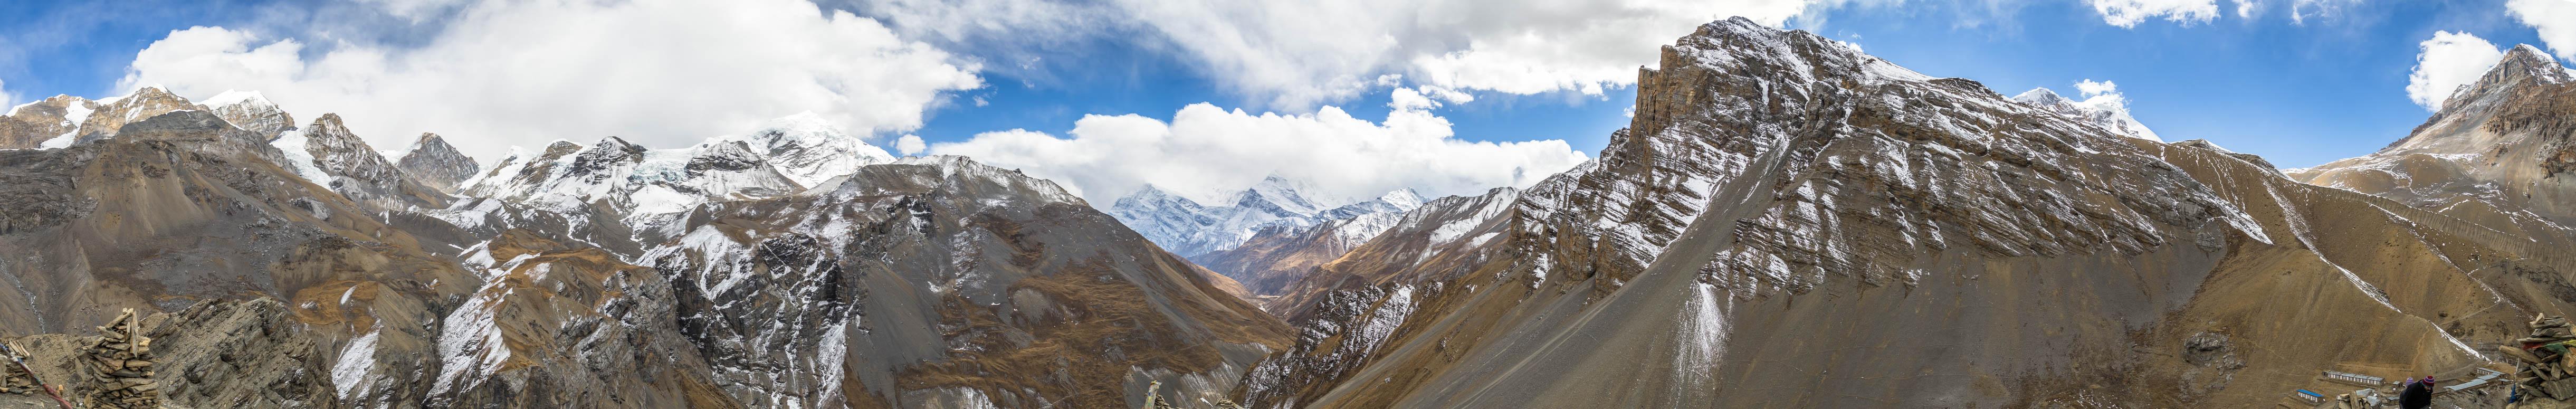 Annapurna Berge